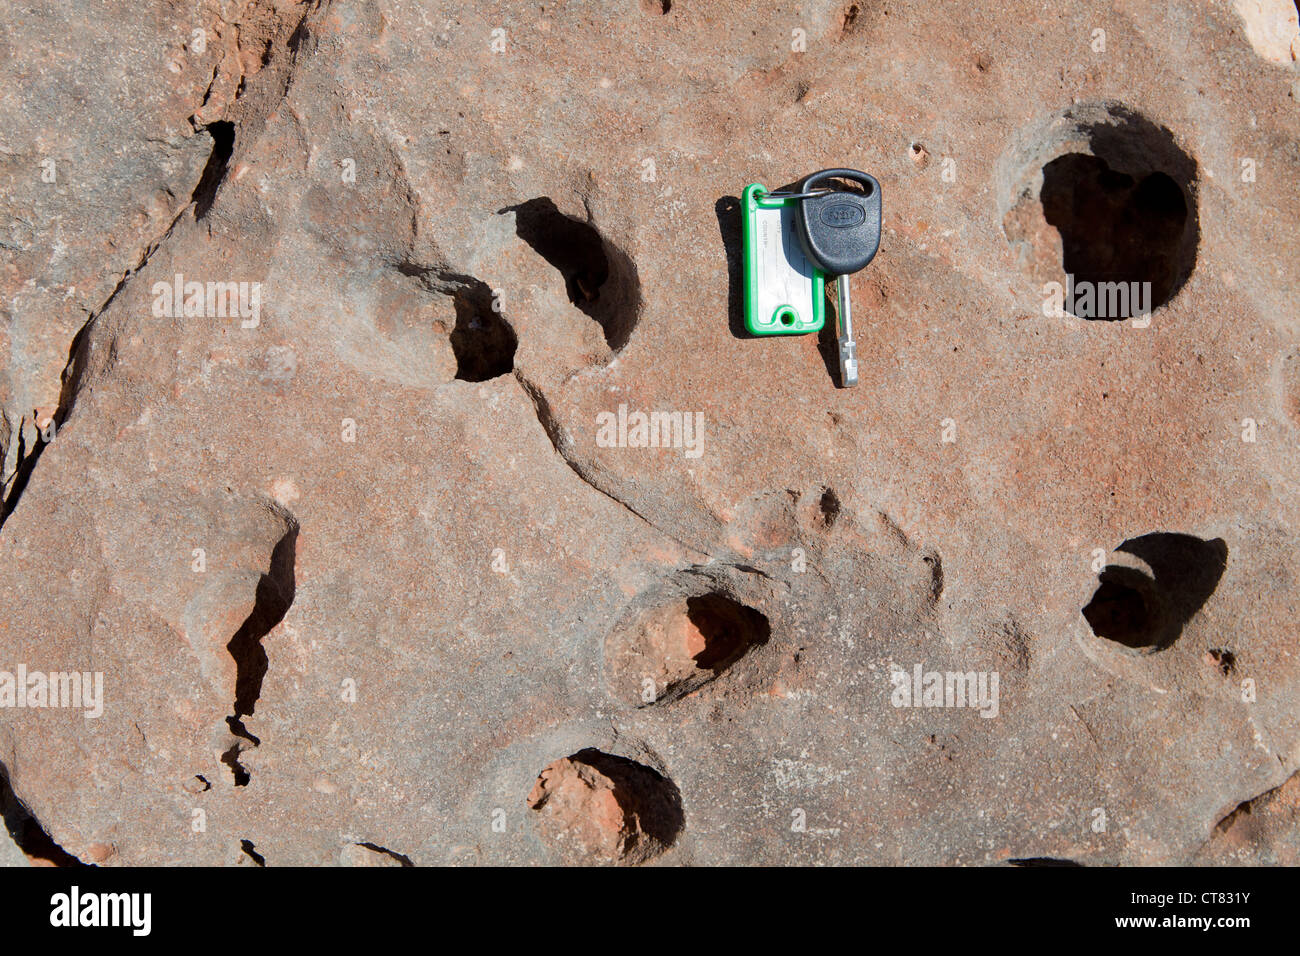 Karst weathering in limestone Stock Photo